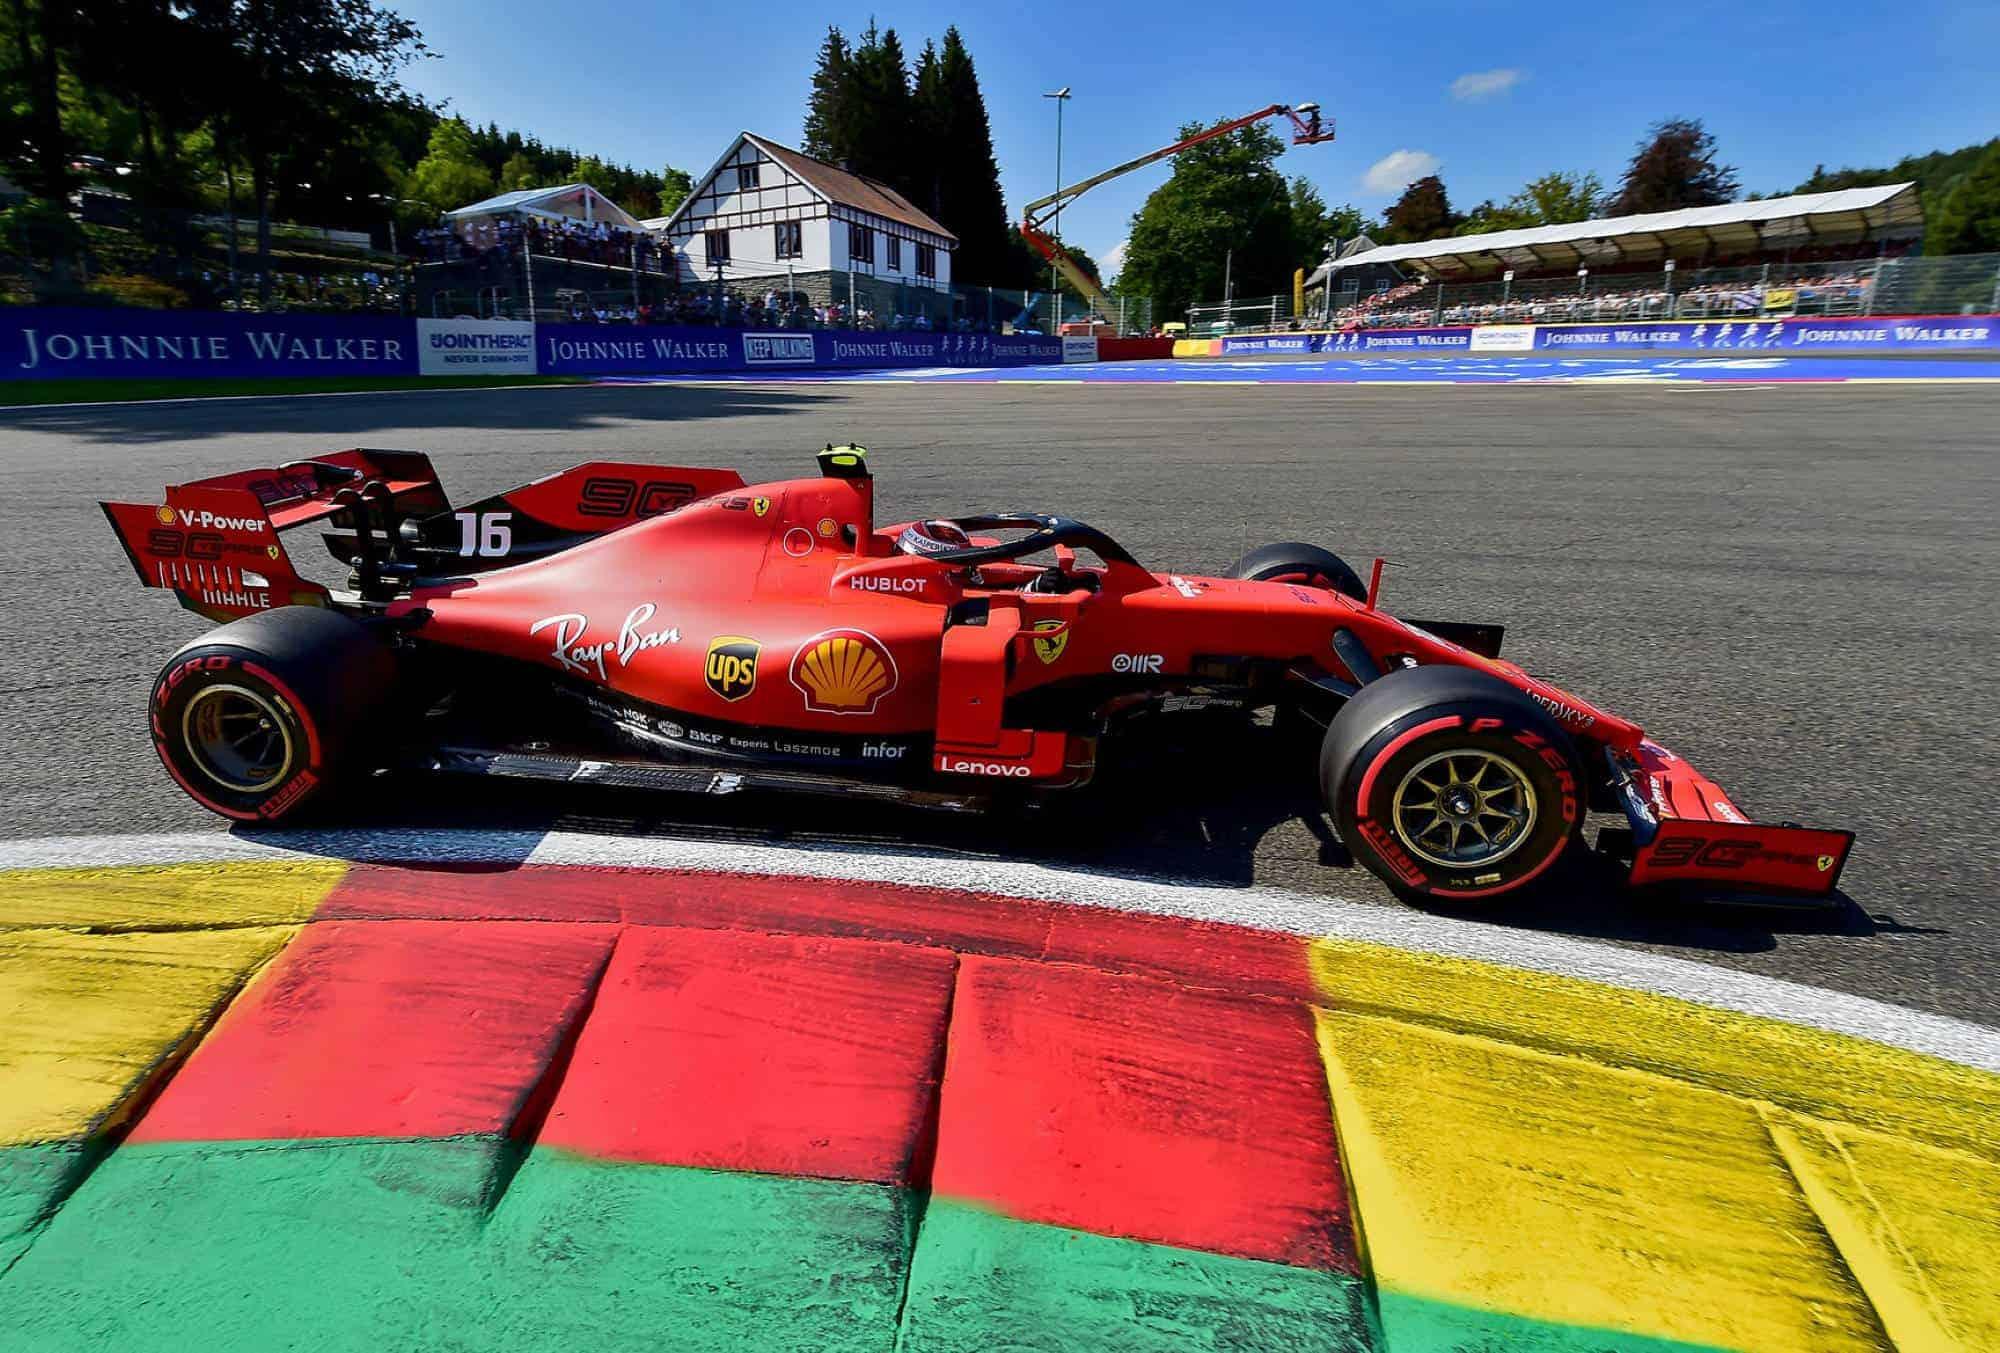 Charles Leclerc Ferrari Belgian GP F1 2019 La Source first corner Photo Ferrari